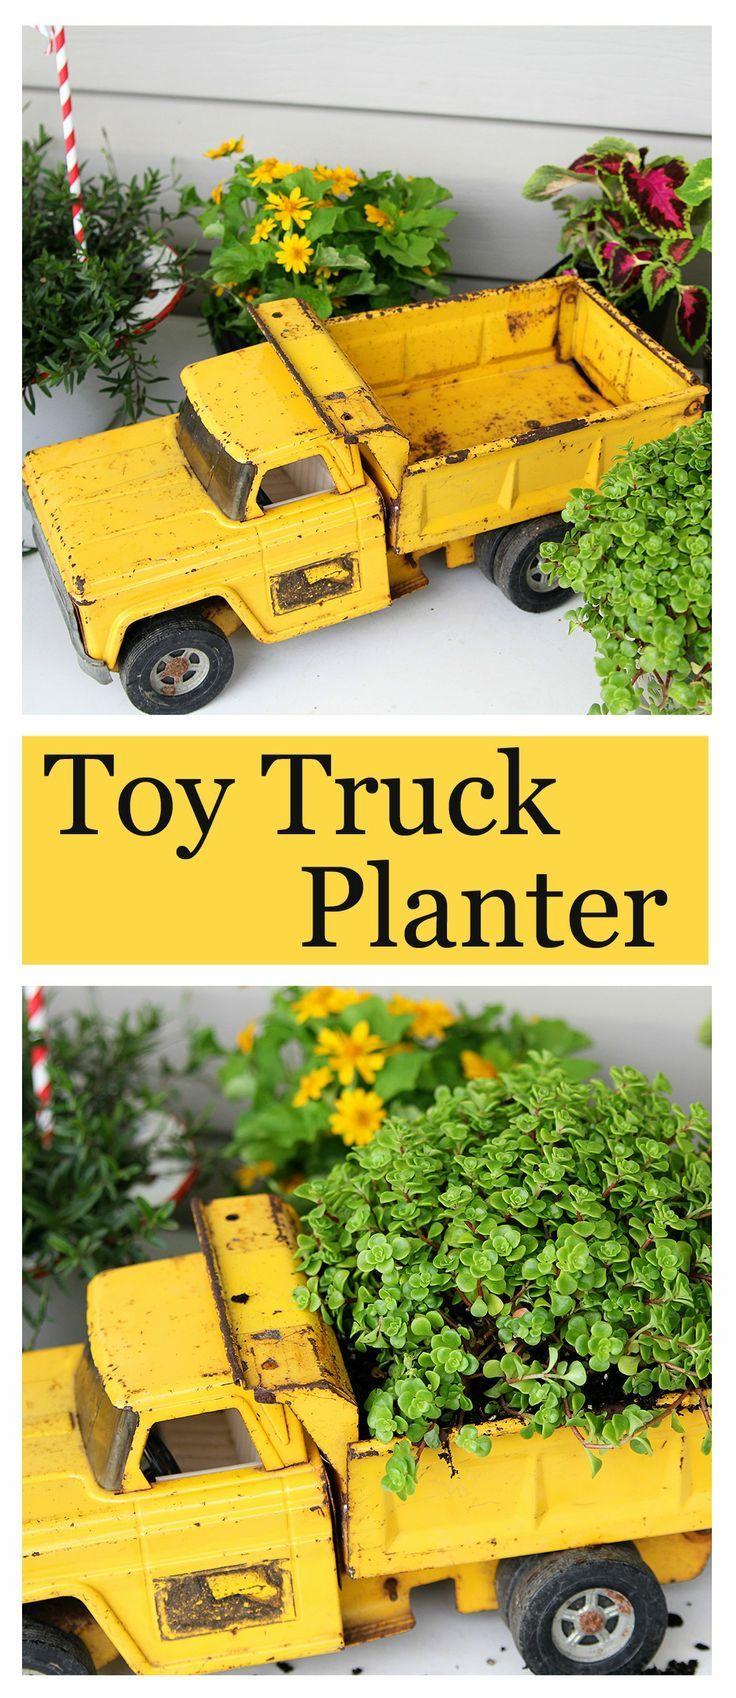 Keep On Trucking: Fun Upcycled Planter Idea | Toy trucks, Yard ...